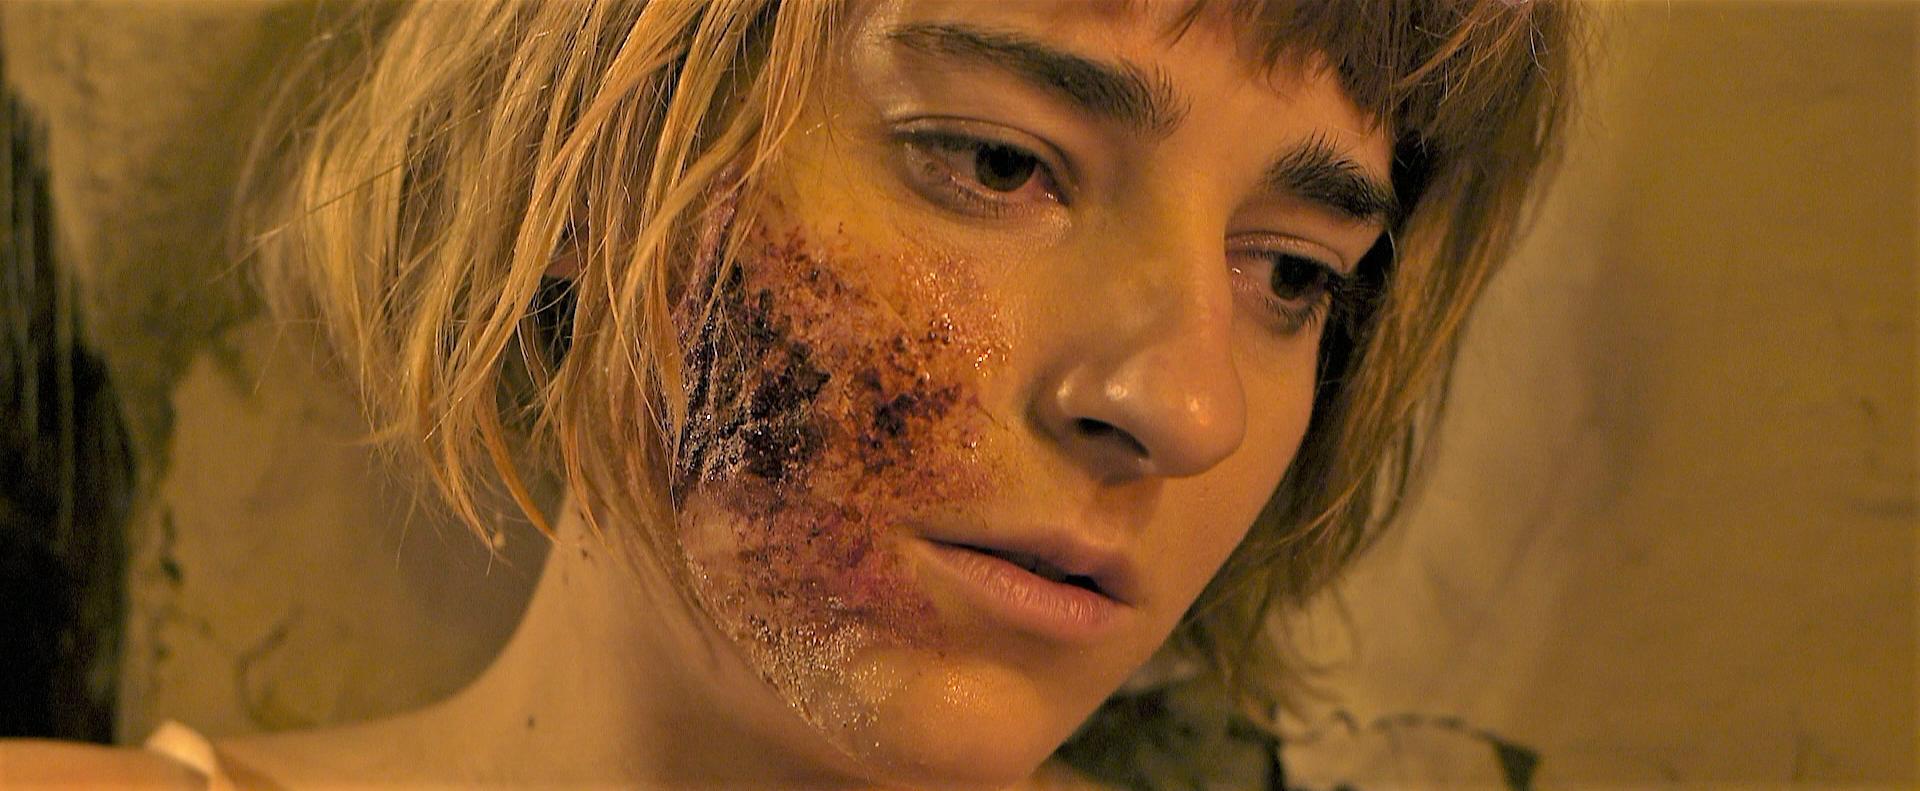 Dominga Bofill in Trauma (2017)